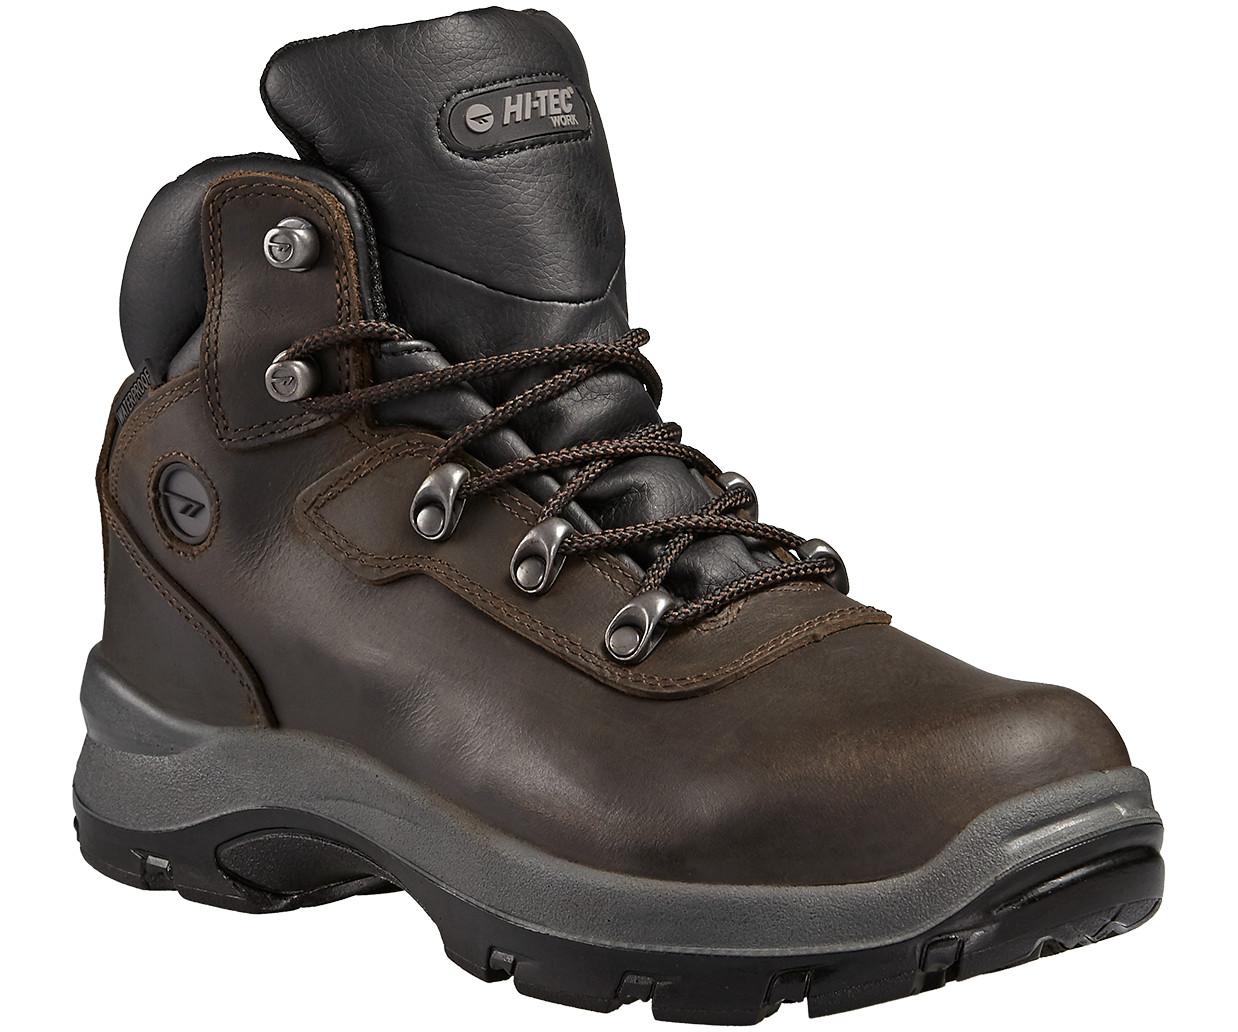 Hi-Tec Blaze Men Safety Hiker Boots